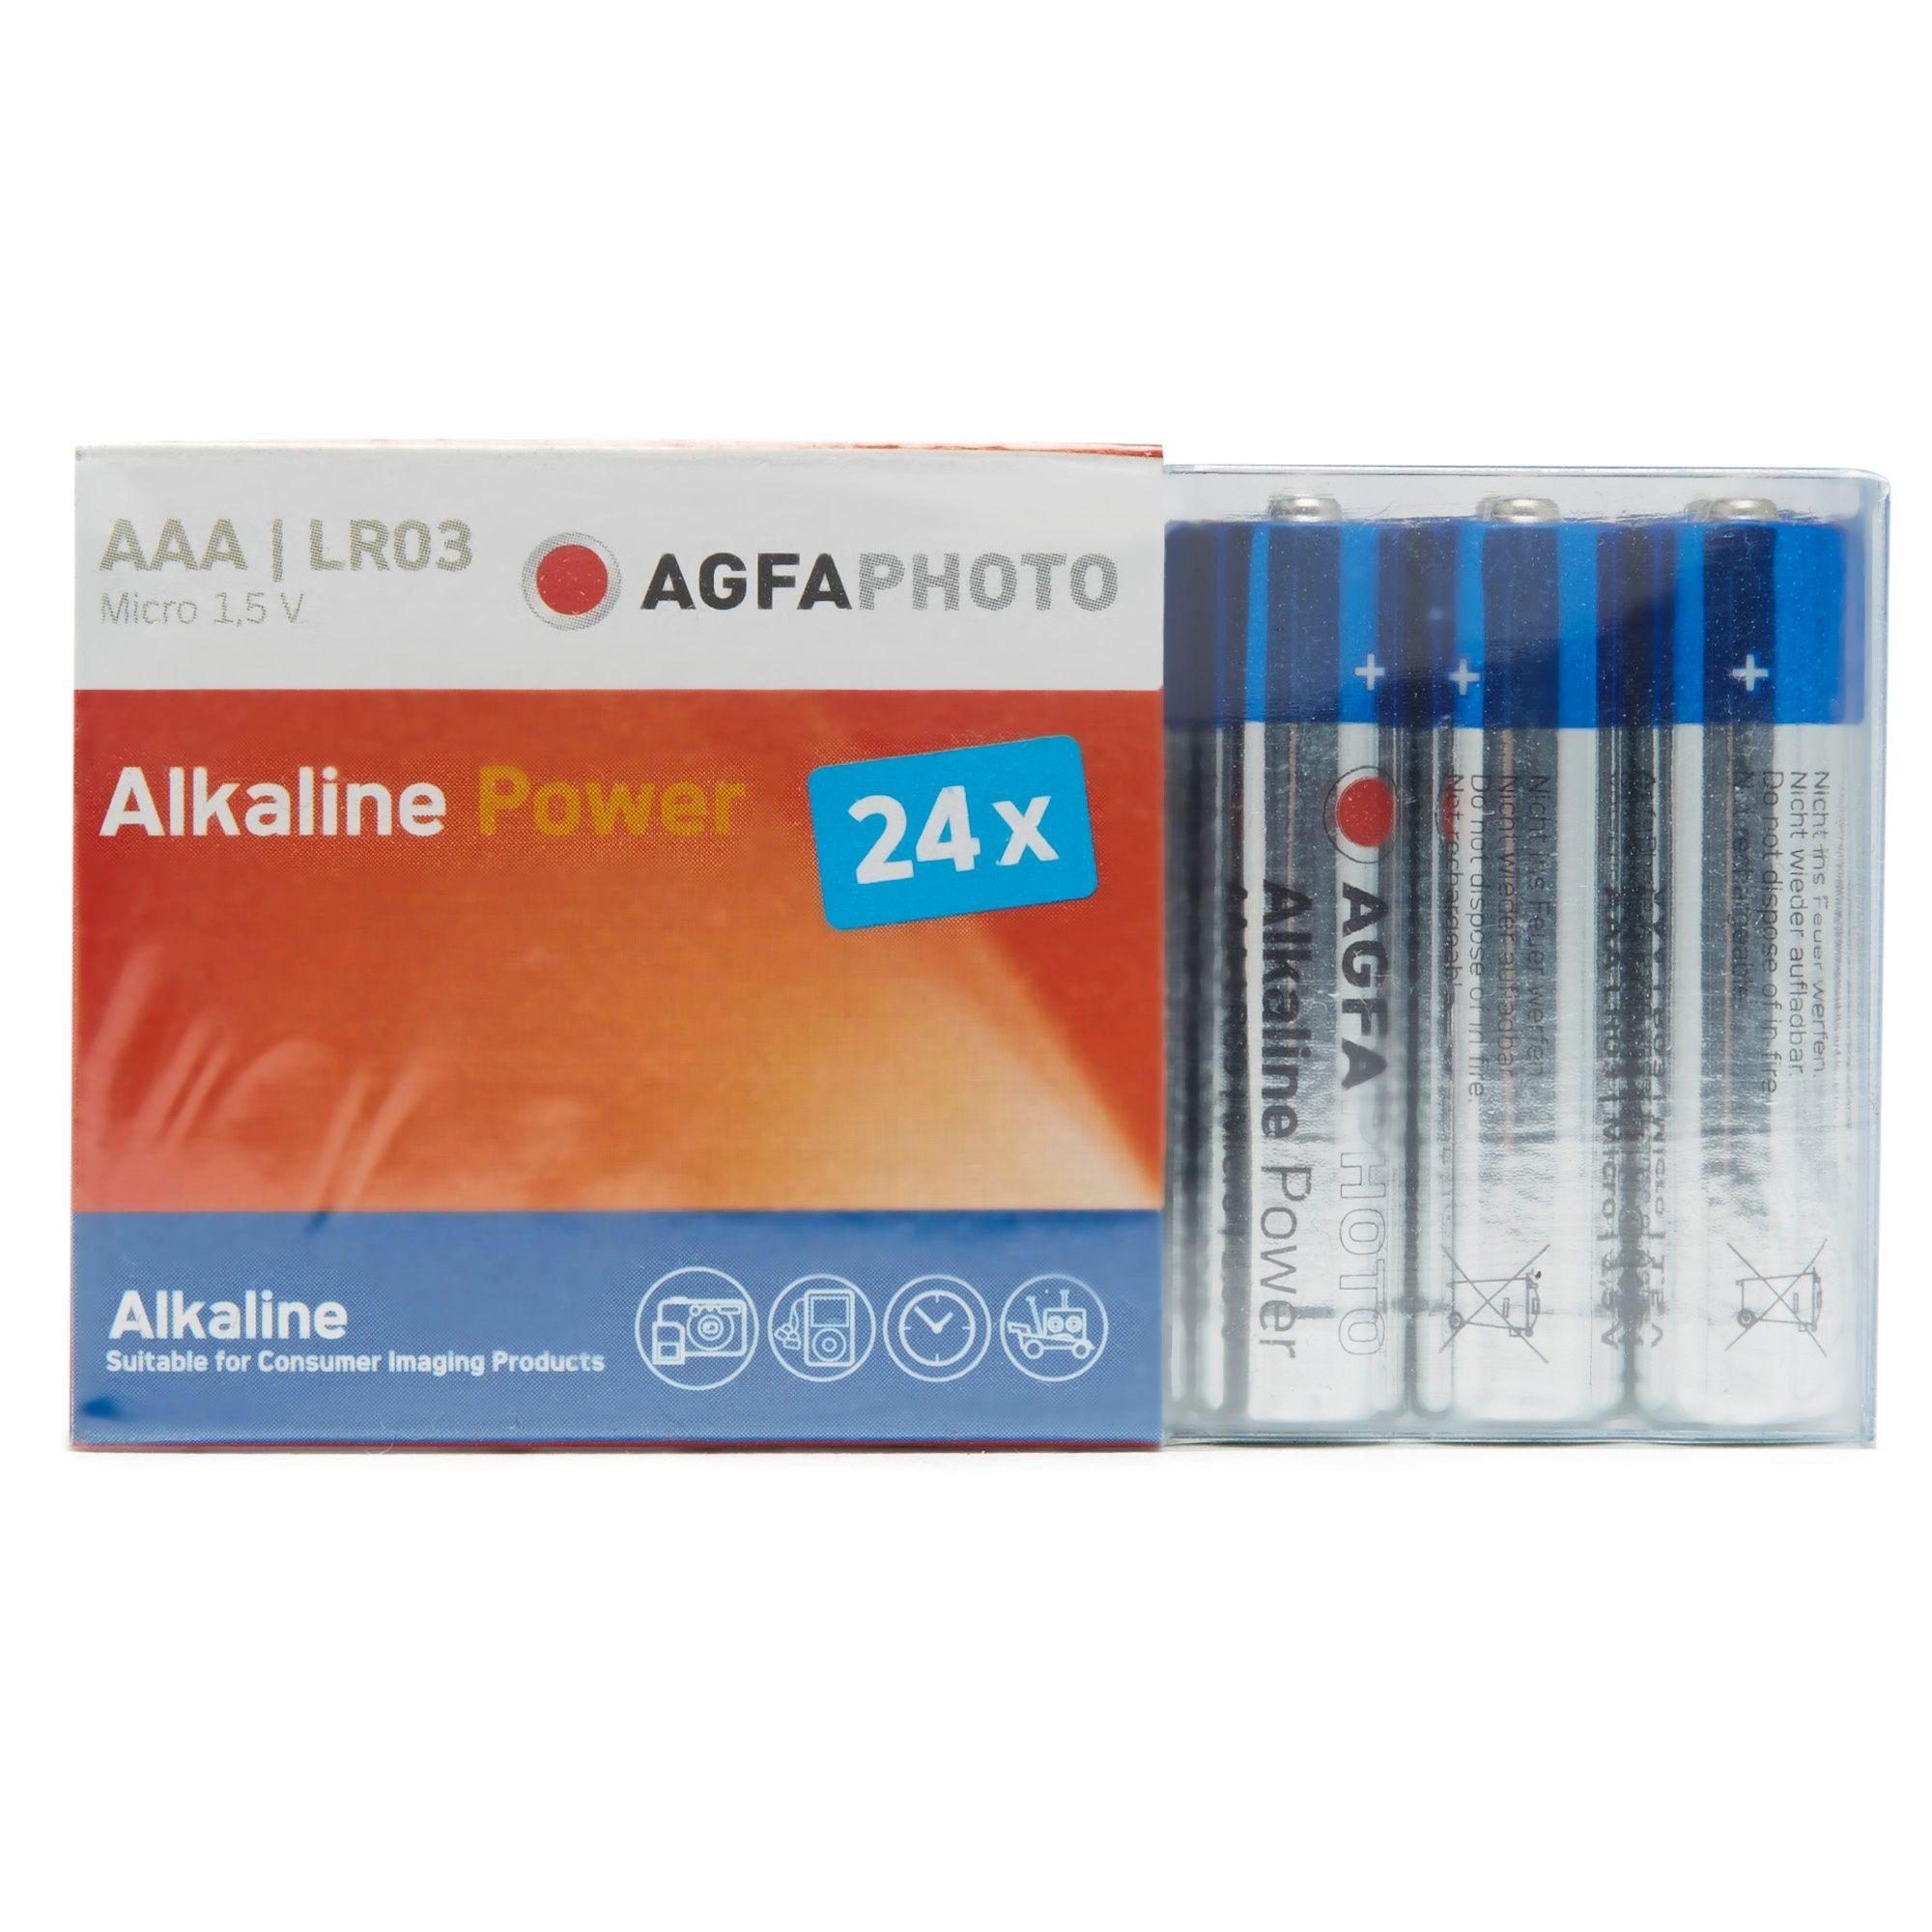 AGFA Alkaline Power AAA LR03 Batteries 24 Pack